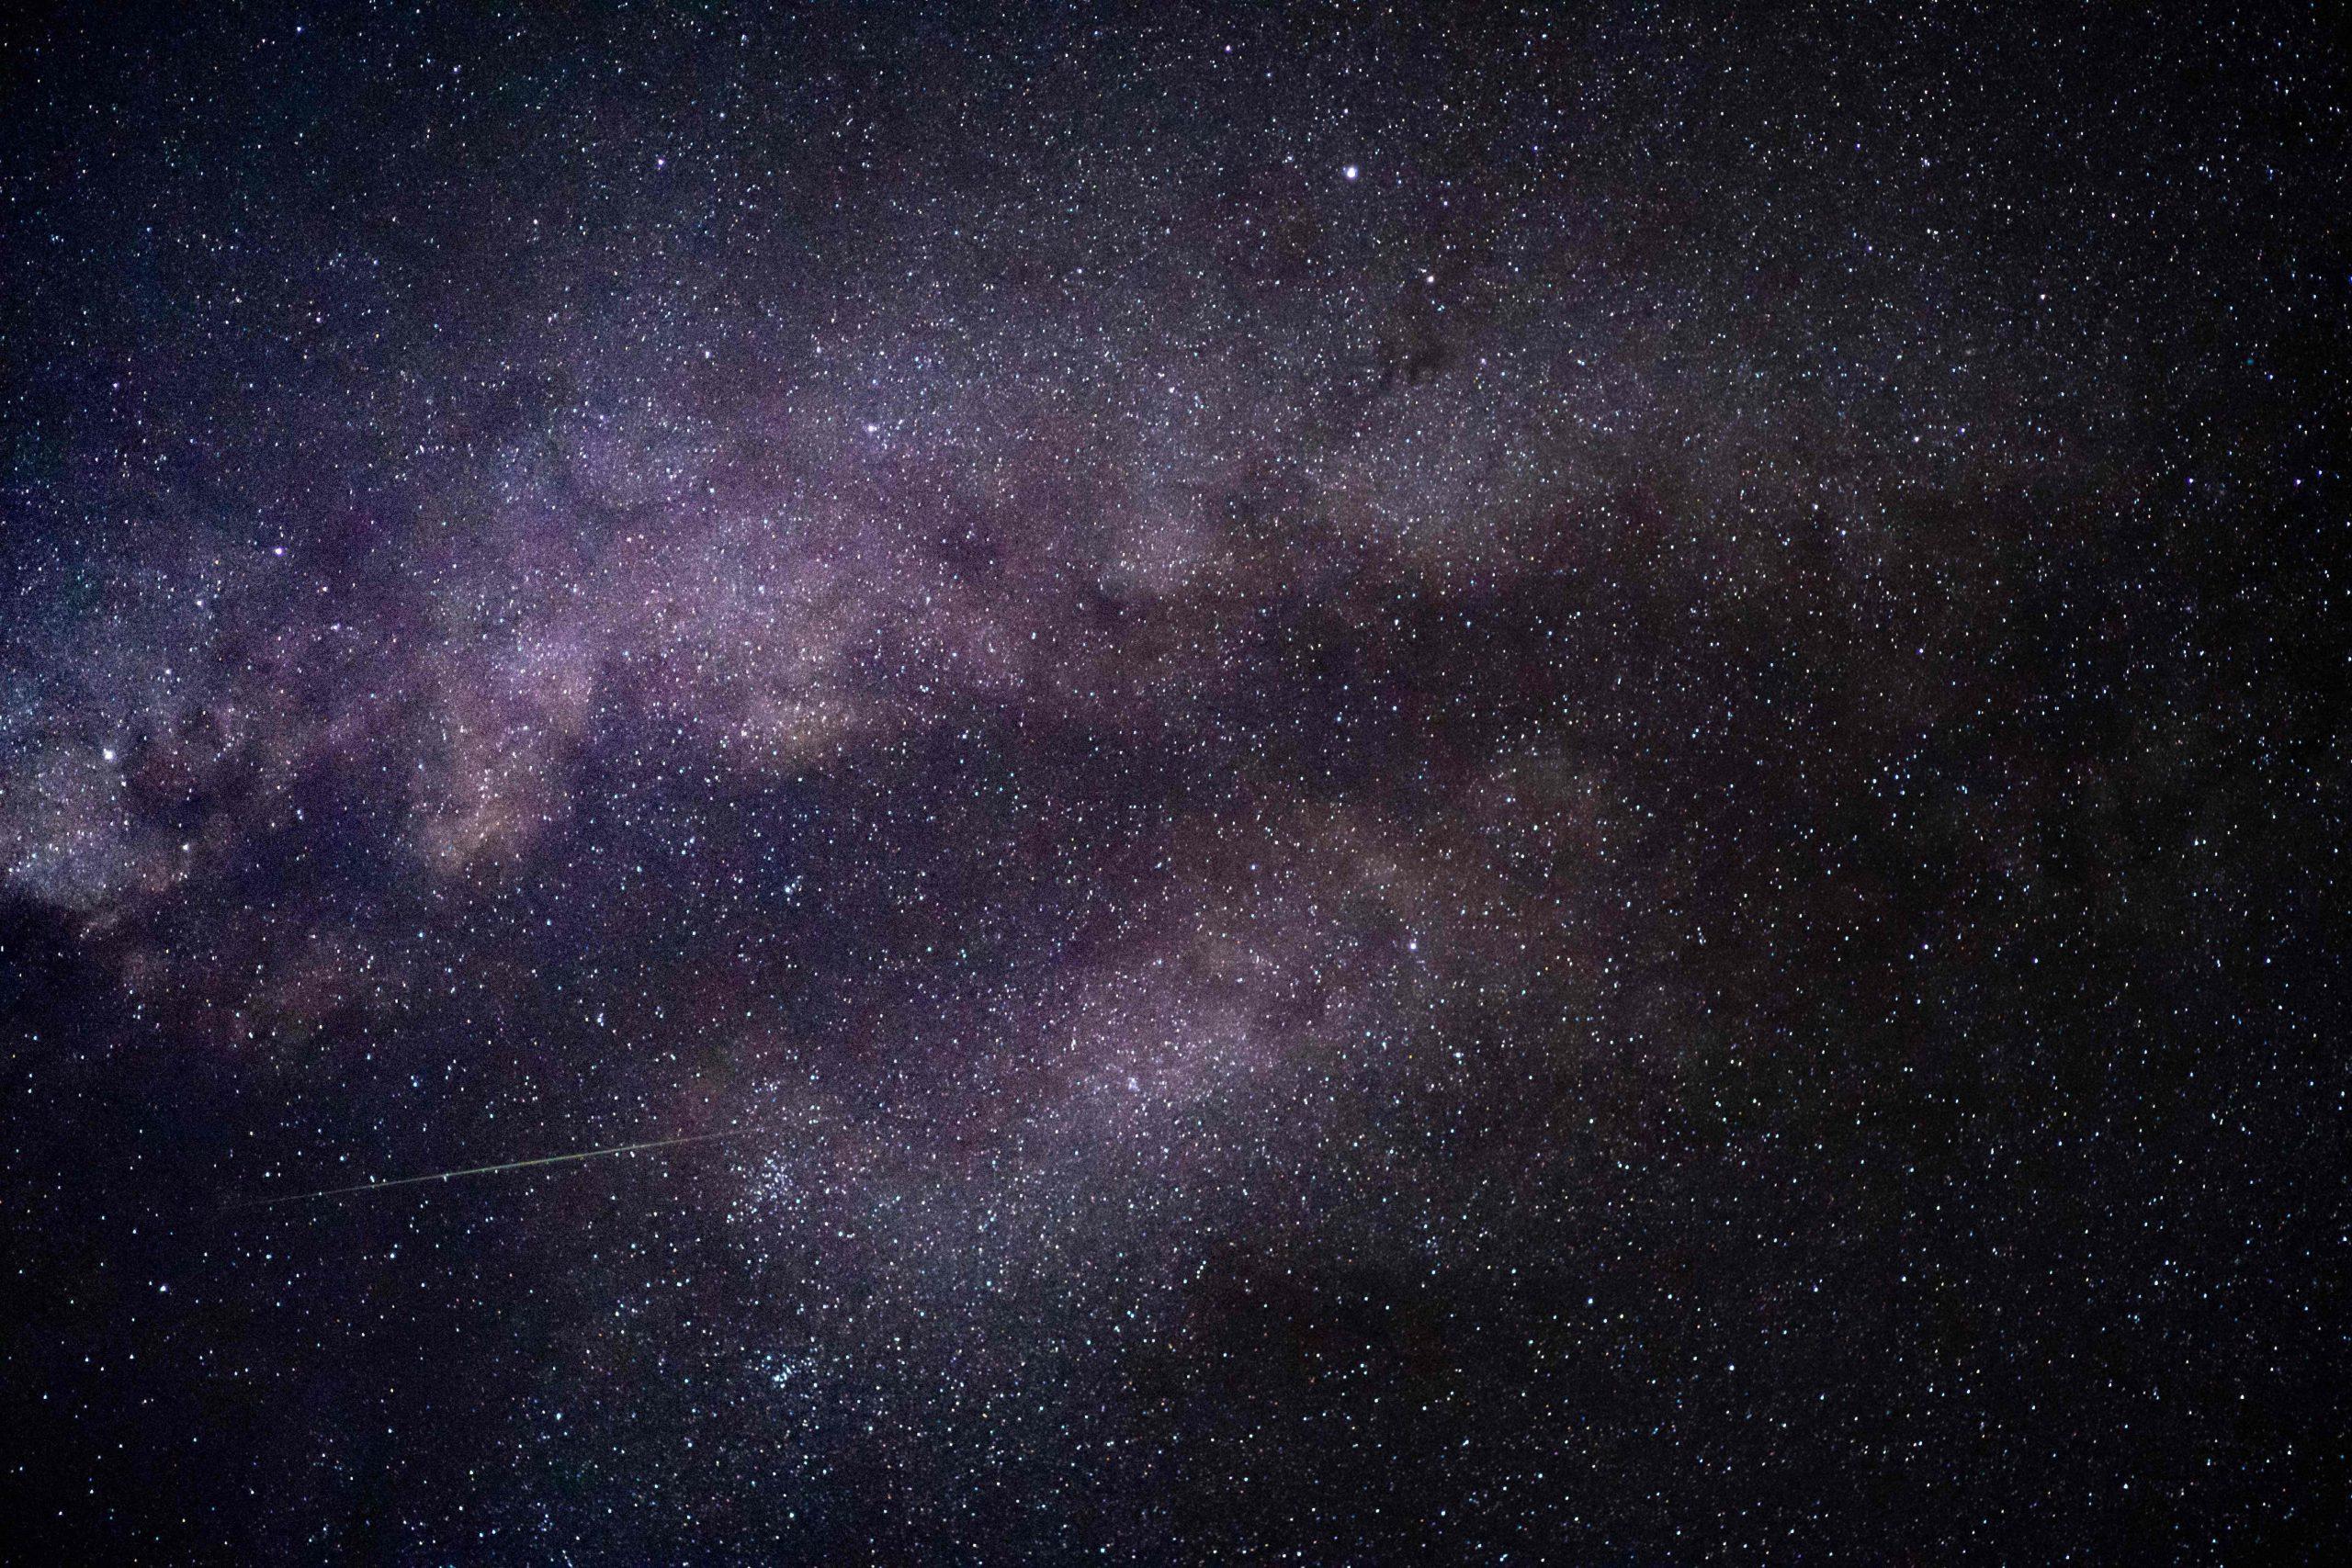 Embrionic Star - Unsplash